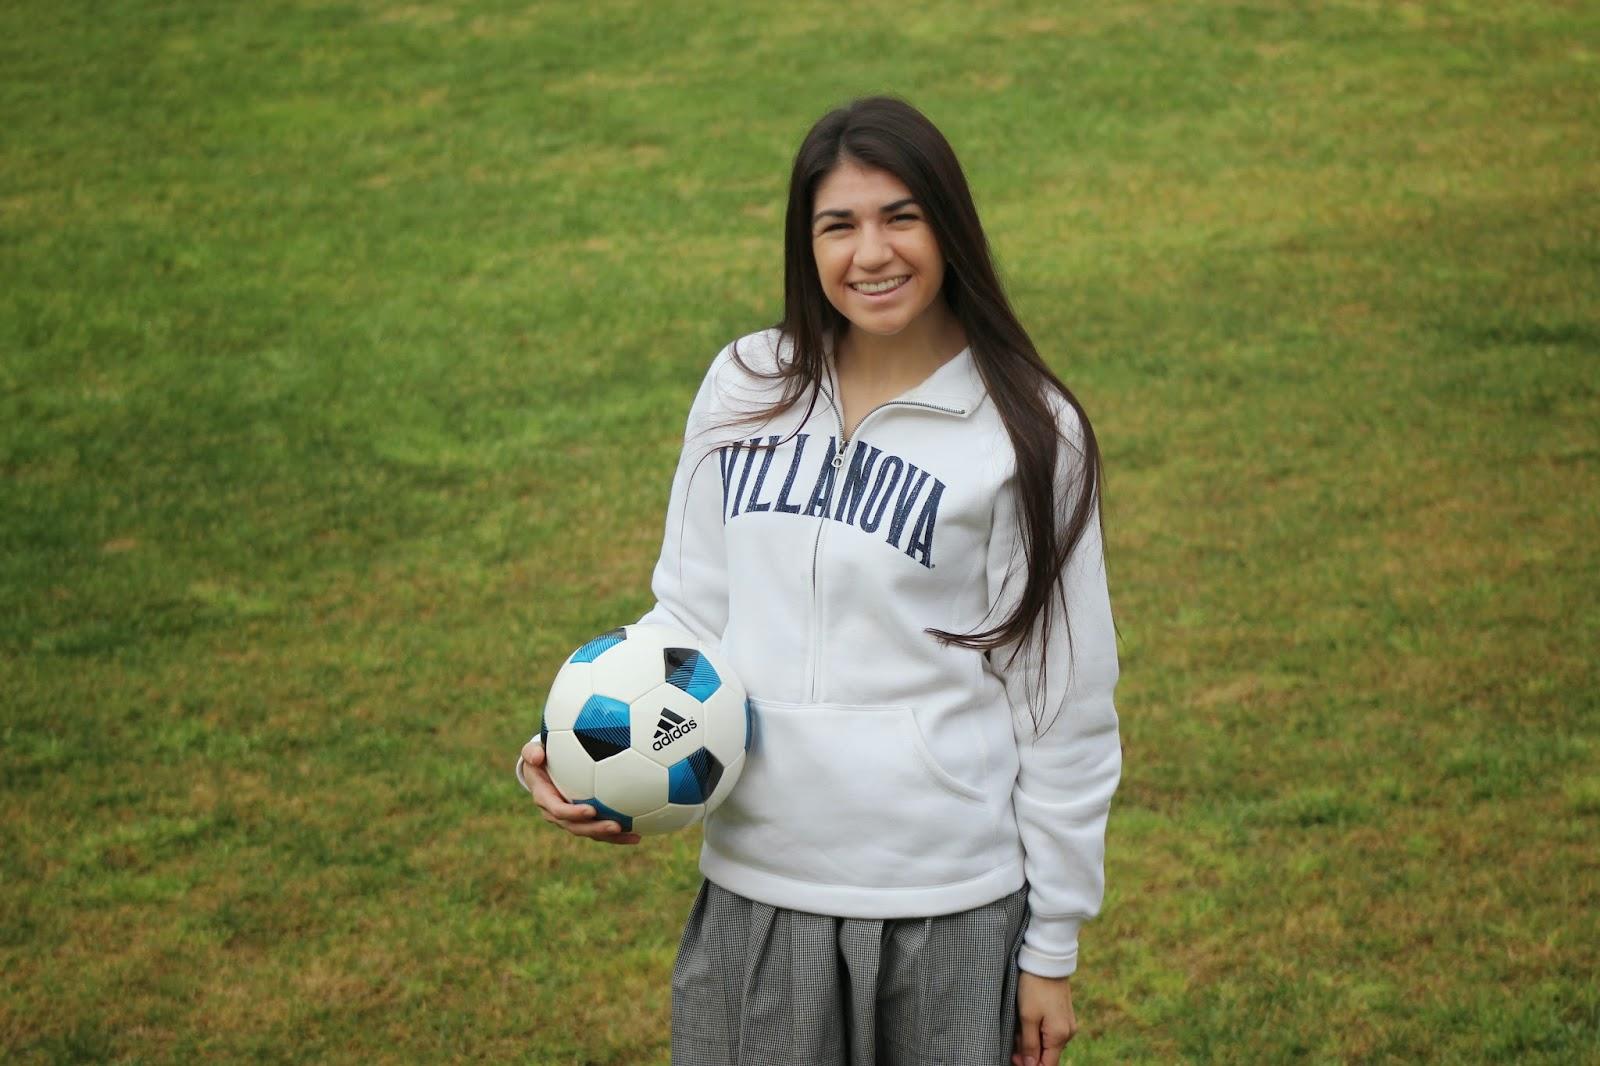 Wallace To Join Villanova Soccer